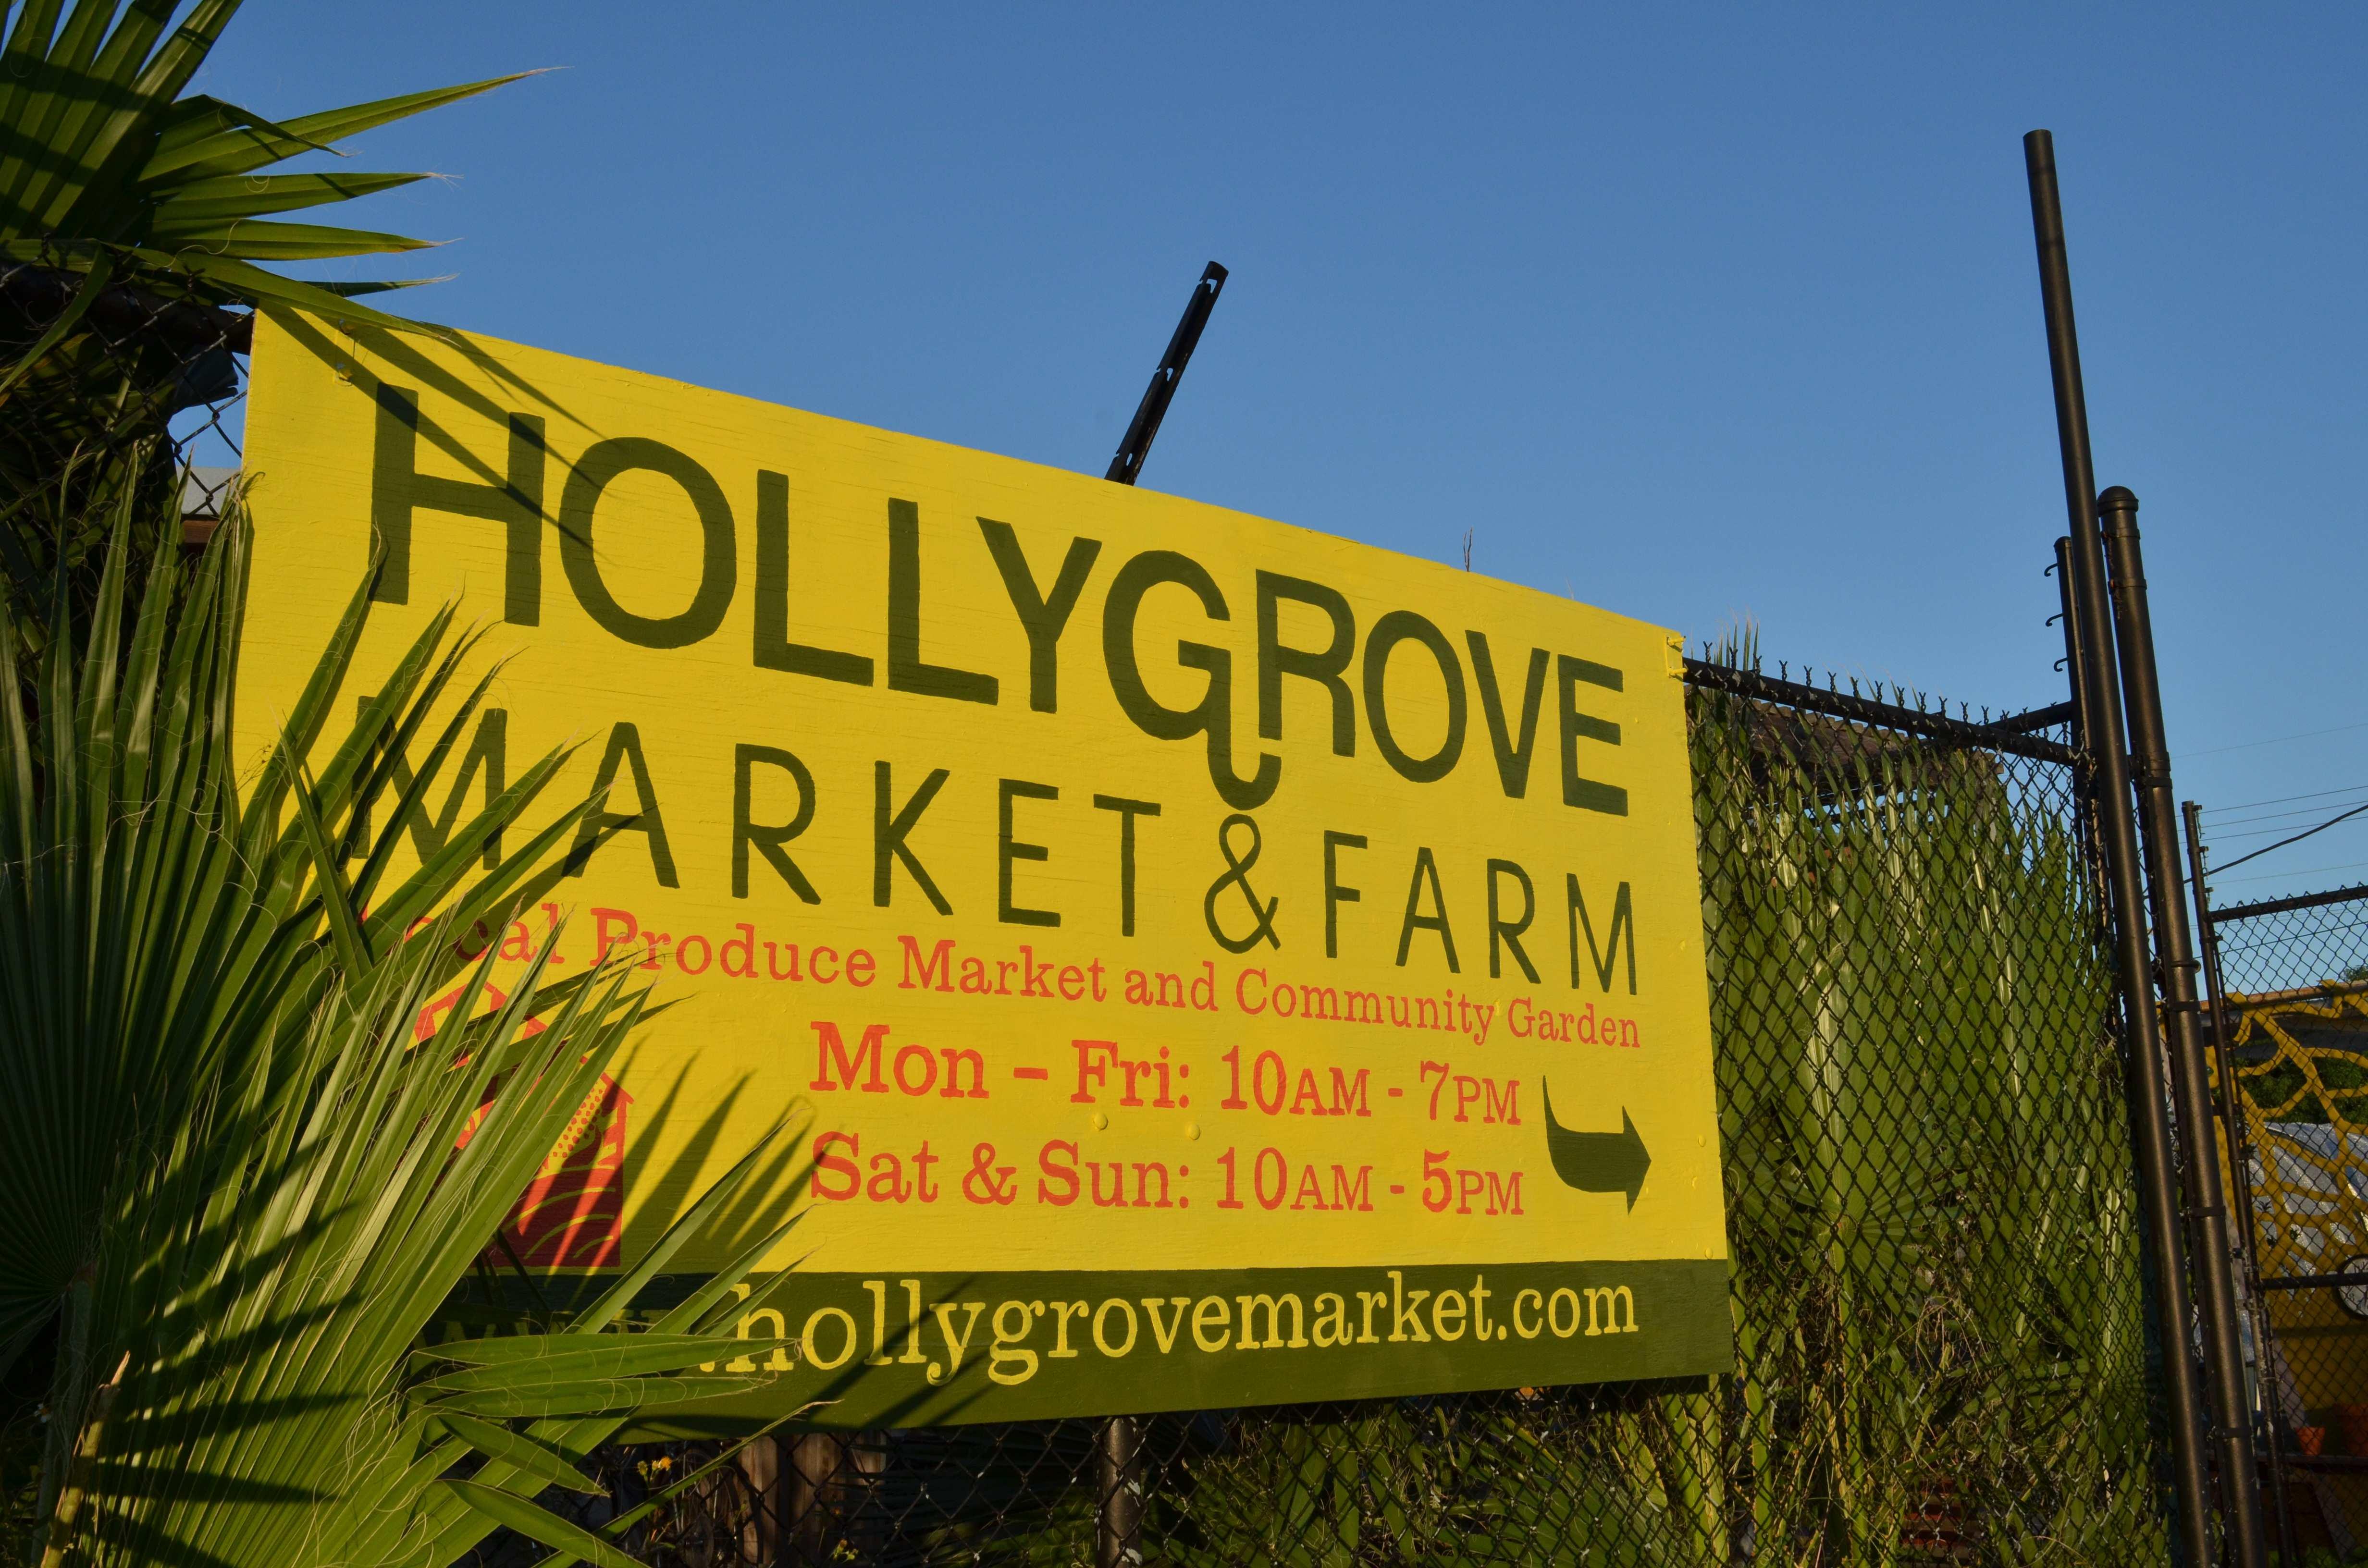 Hollygrove Market sign photo